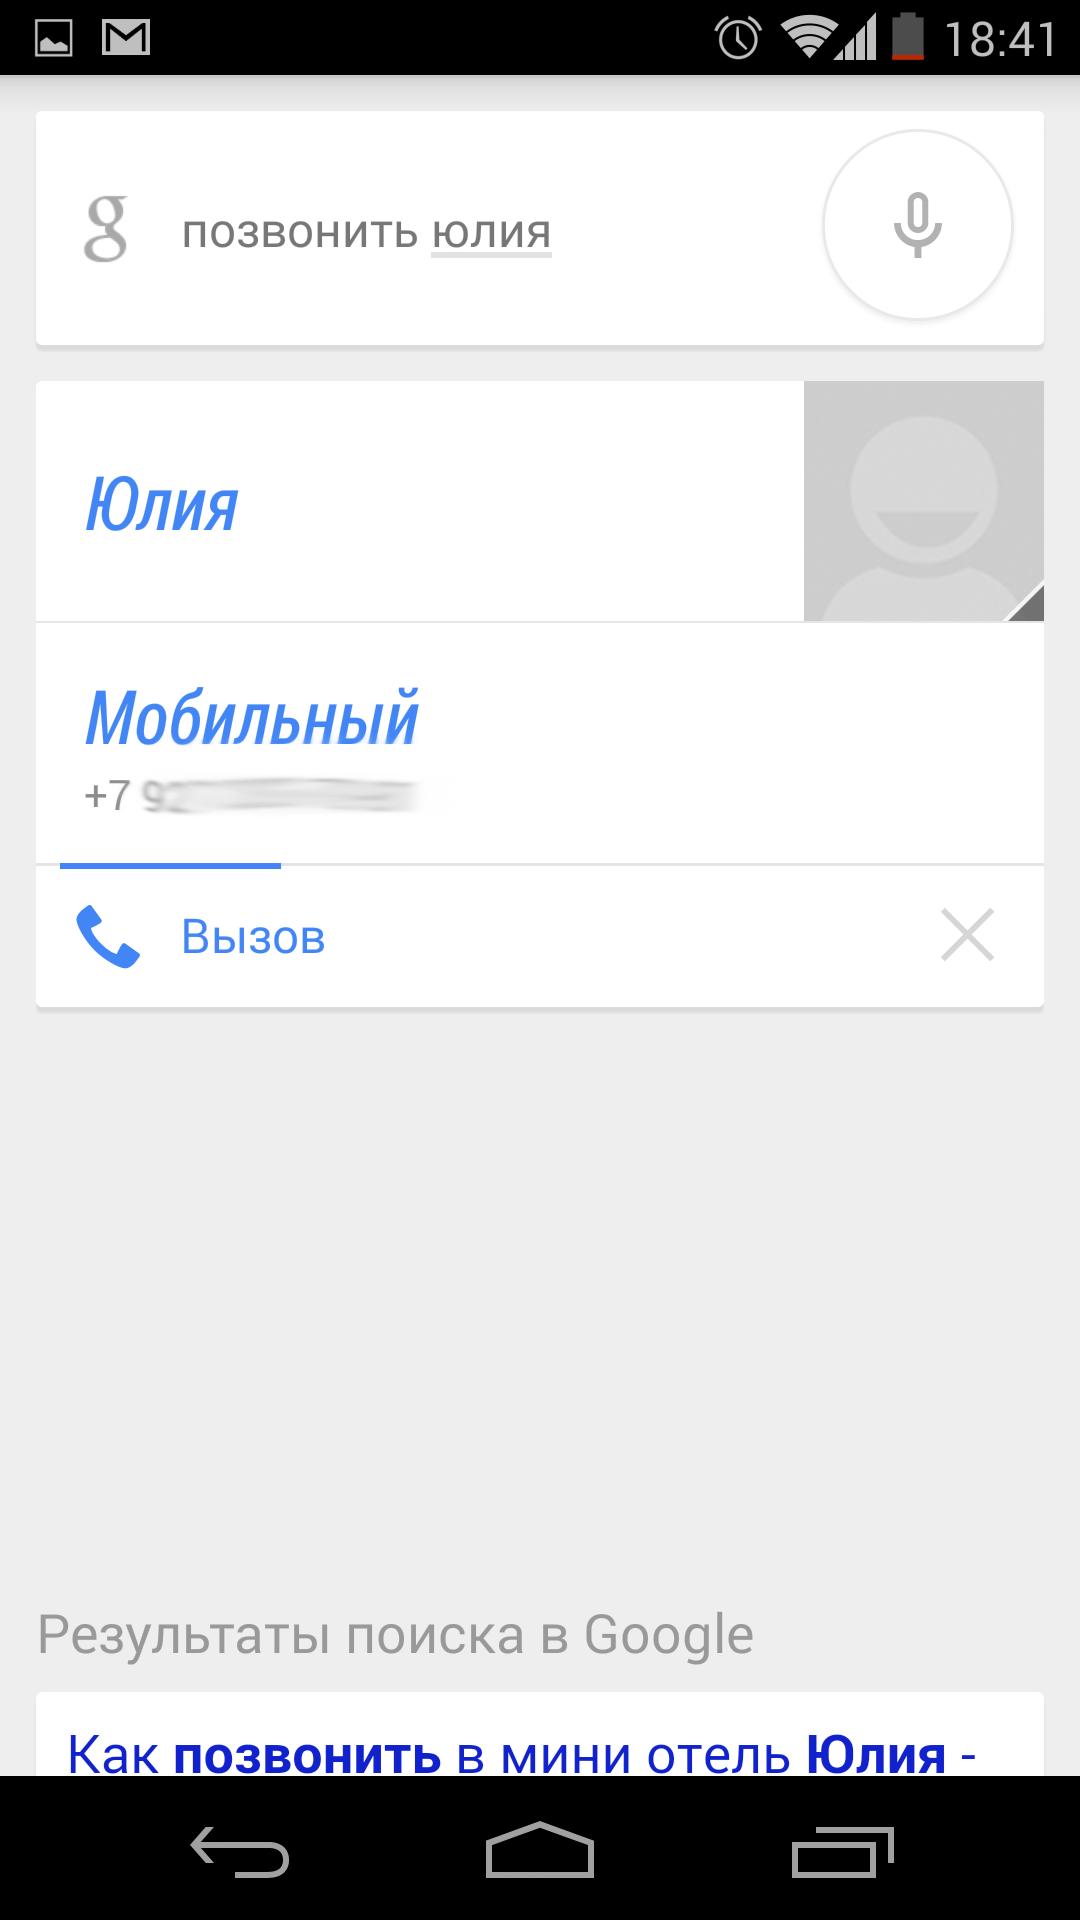 Screenshot_2013-12-11-18-41-49